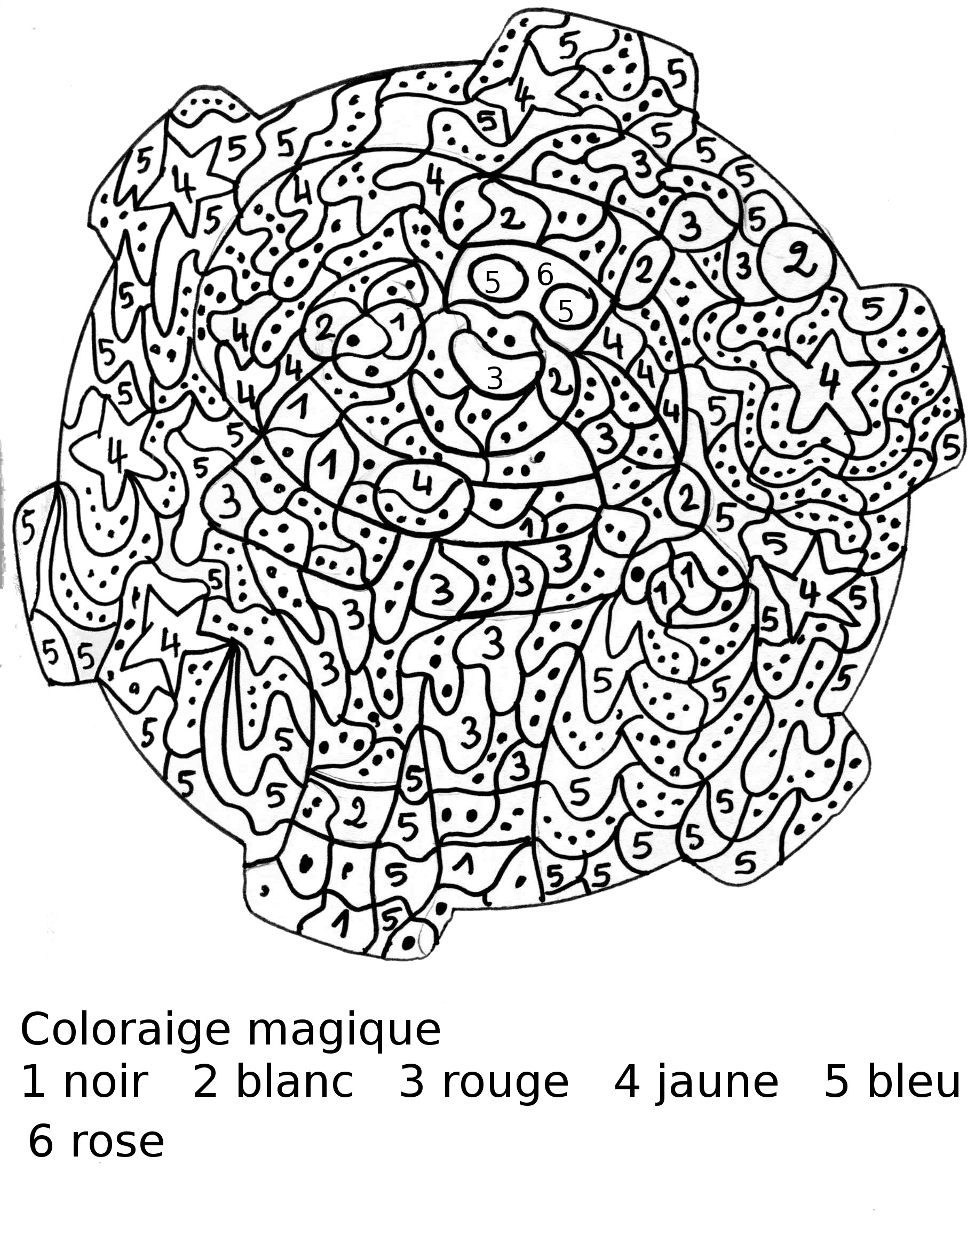 Coloriage magique de noel cm1 a imprimer - Dessin magique multiplication ...